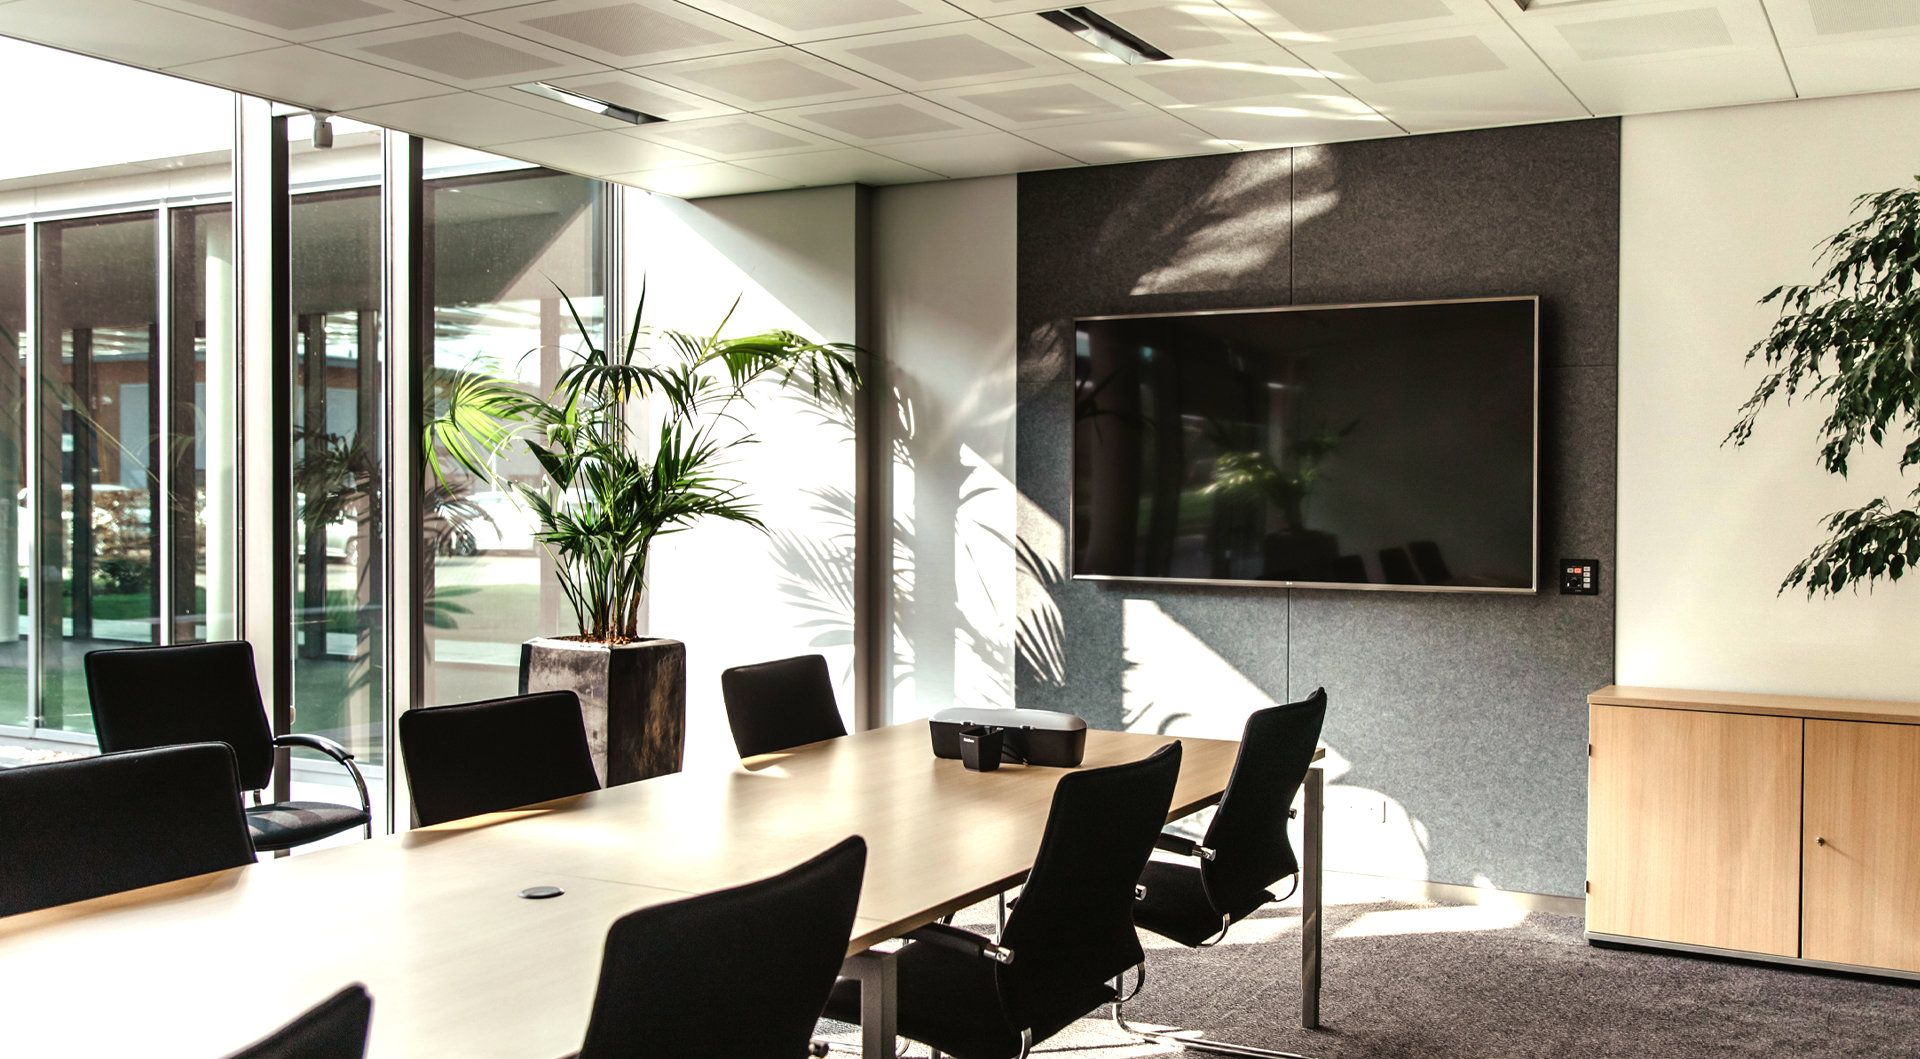 Chief TPMUB flat panel muur steun Zwart - Case studie de vries